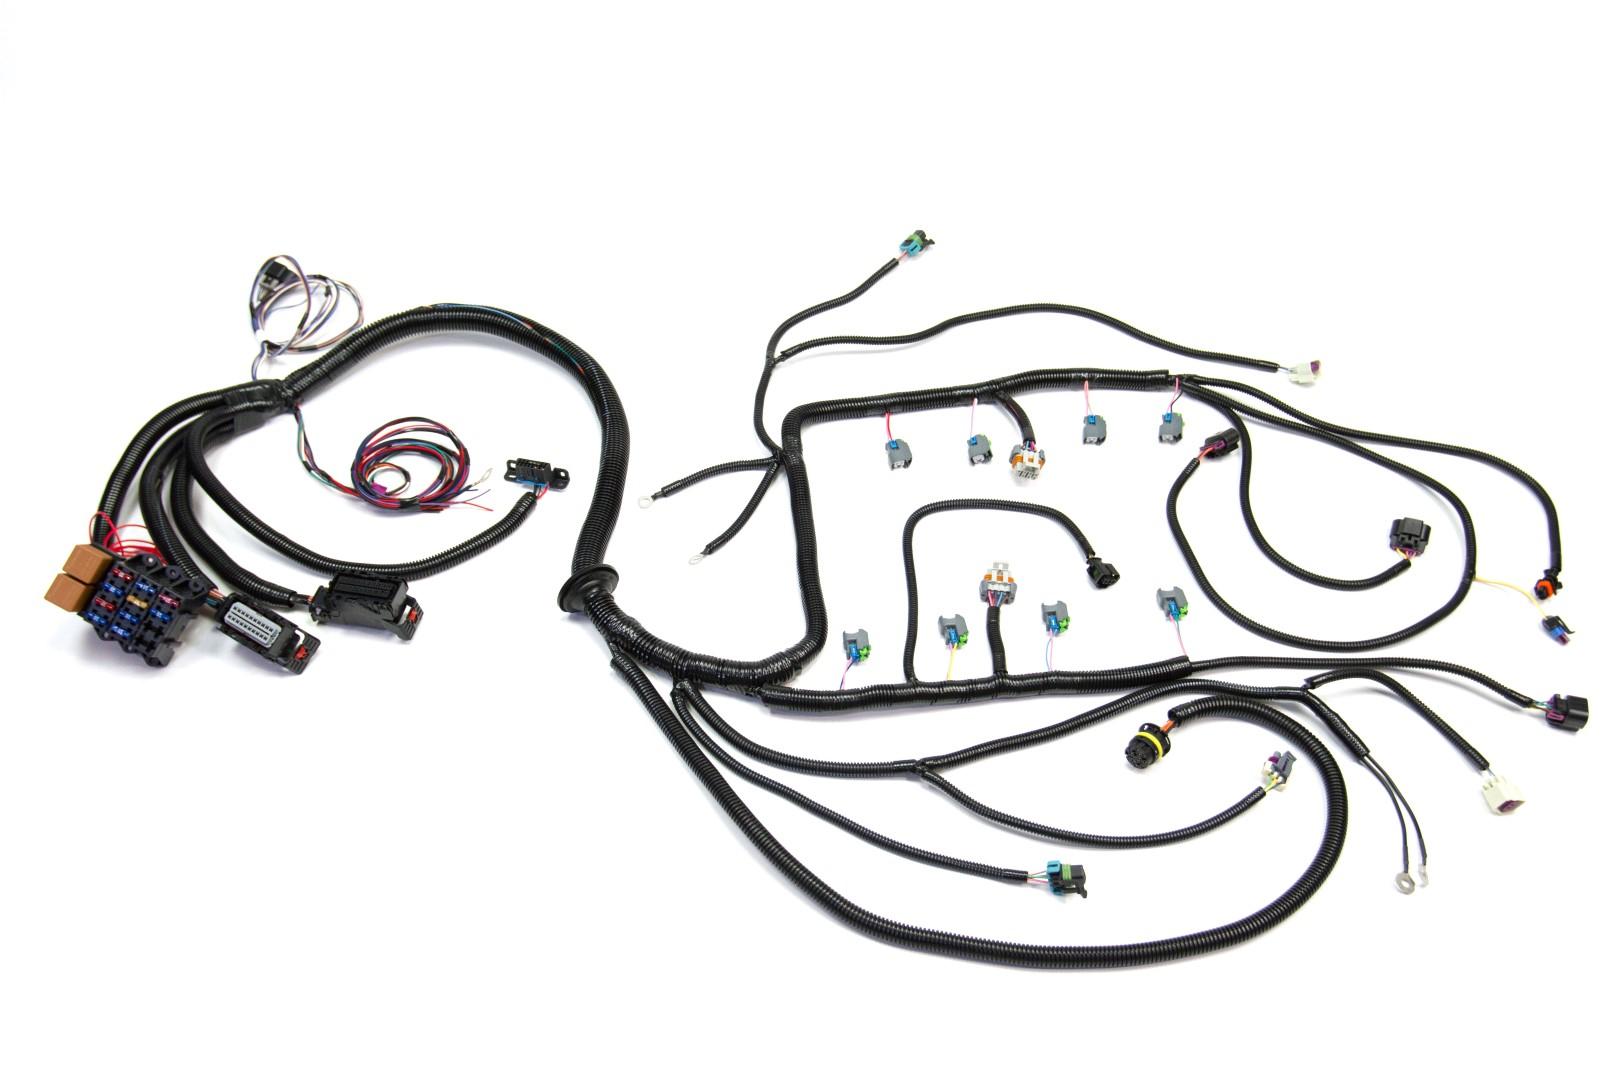 hight resolution of 08 13 ls3 6 2l standalone wiring harness w 6l80e custom image ls1 corvette engine wiring harness